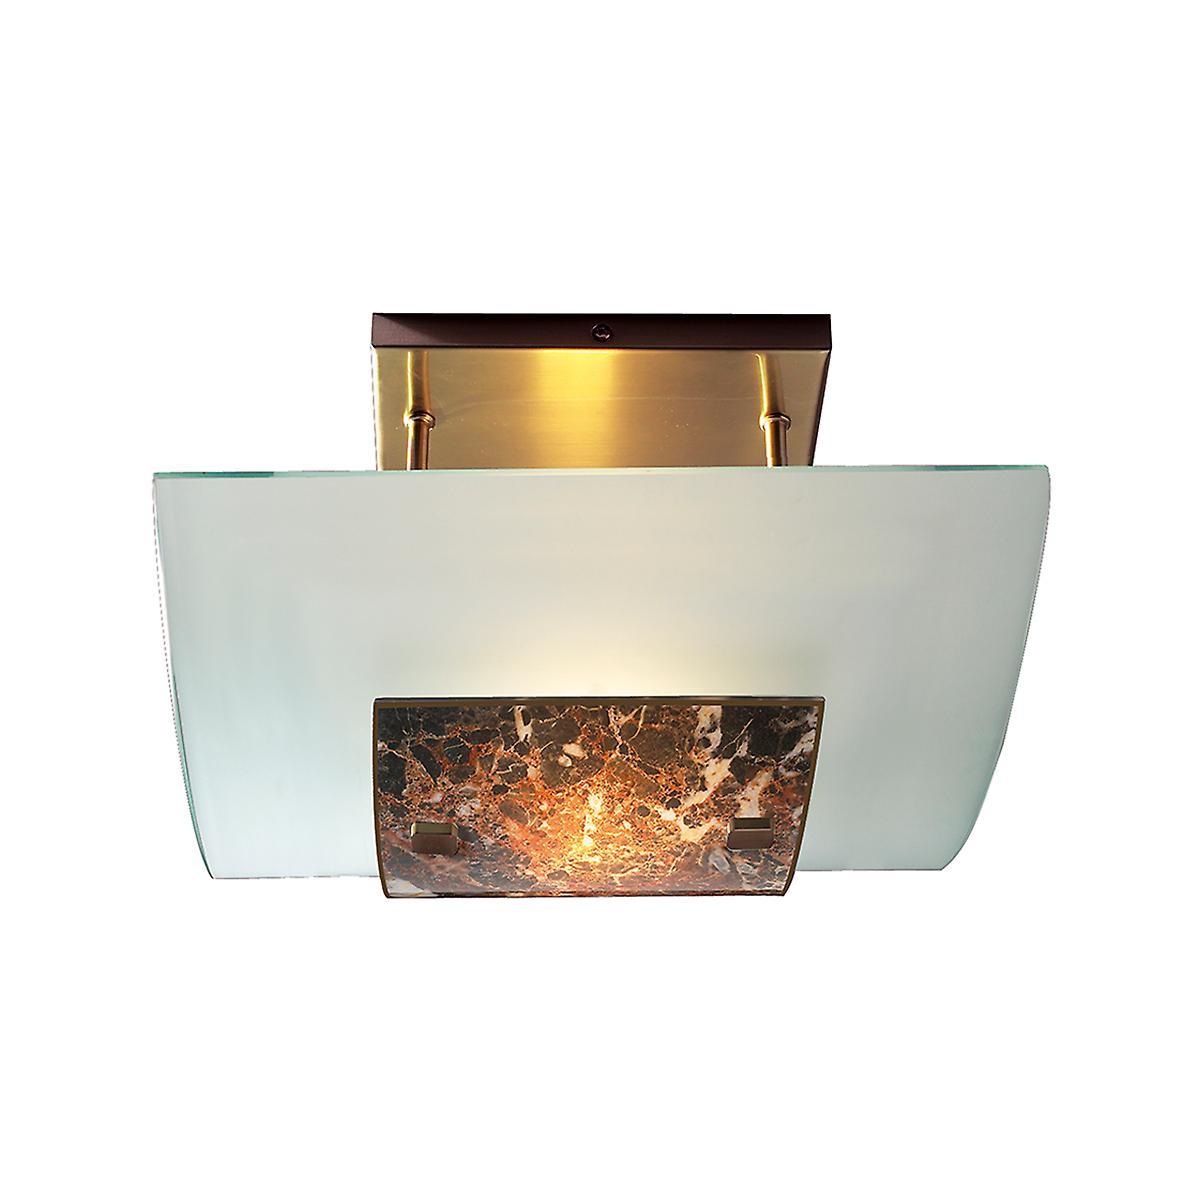 David Hunt MG78 Savoy Semi Flush Ceiling Light In Antique Brass With Dark Glass